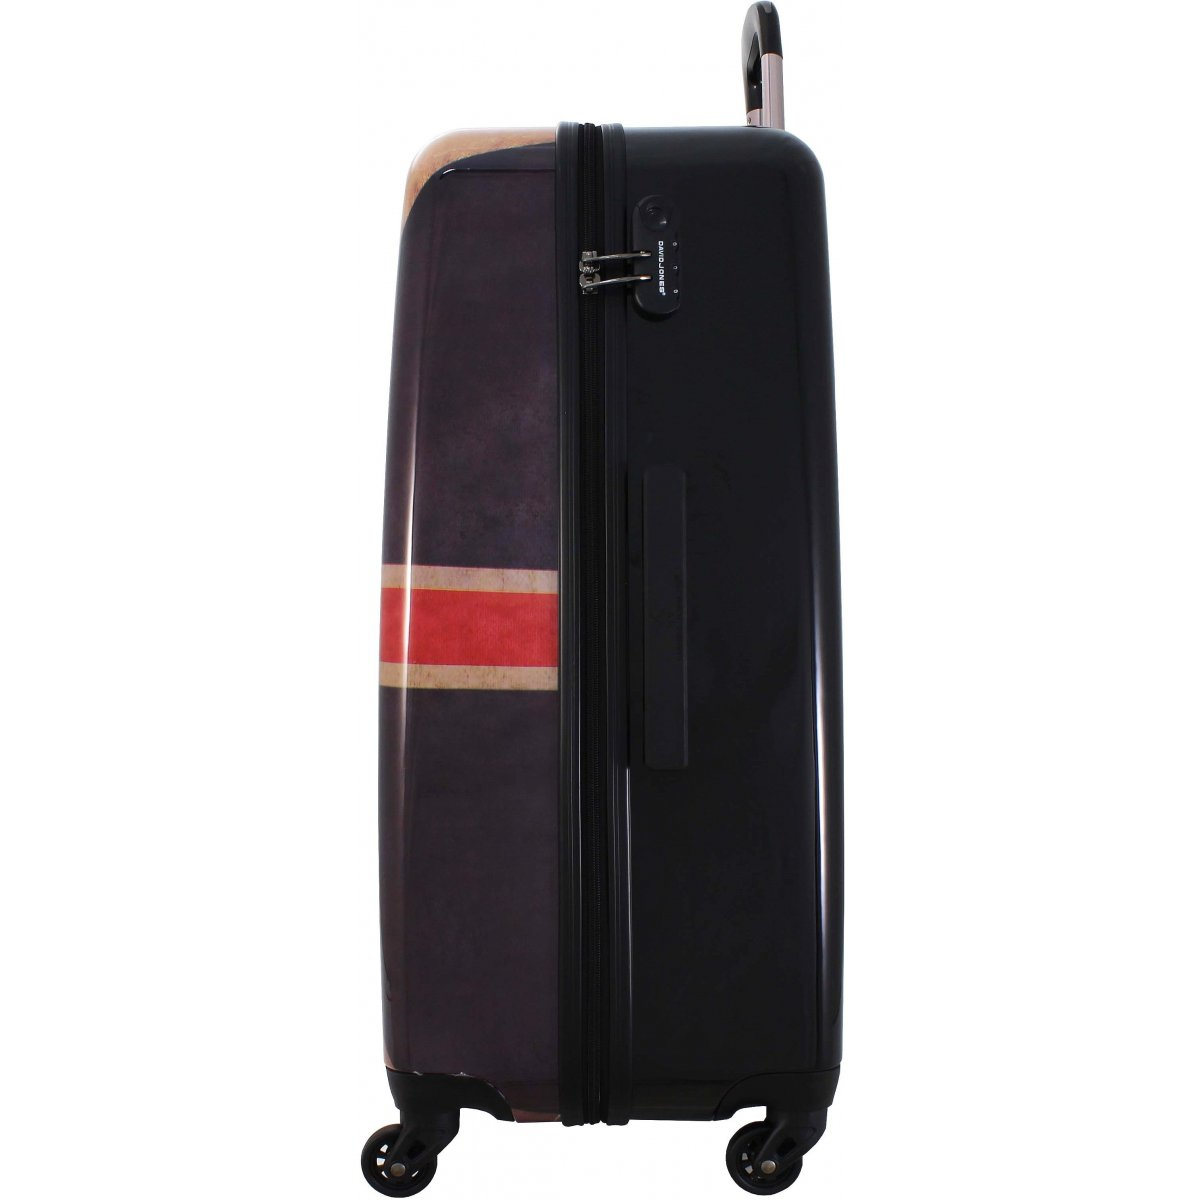 valise rigide david jones 66cm ba20571m couleur principale drapeau uk promotion. Black Bedroom Furniture Sets. Home Design Ideas